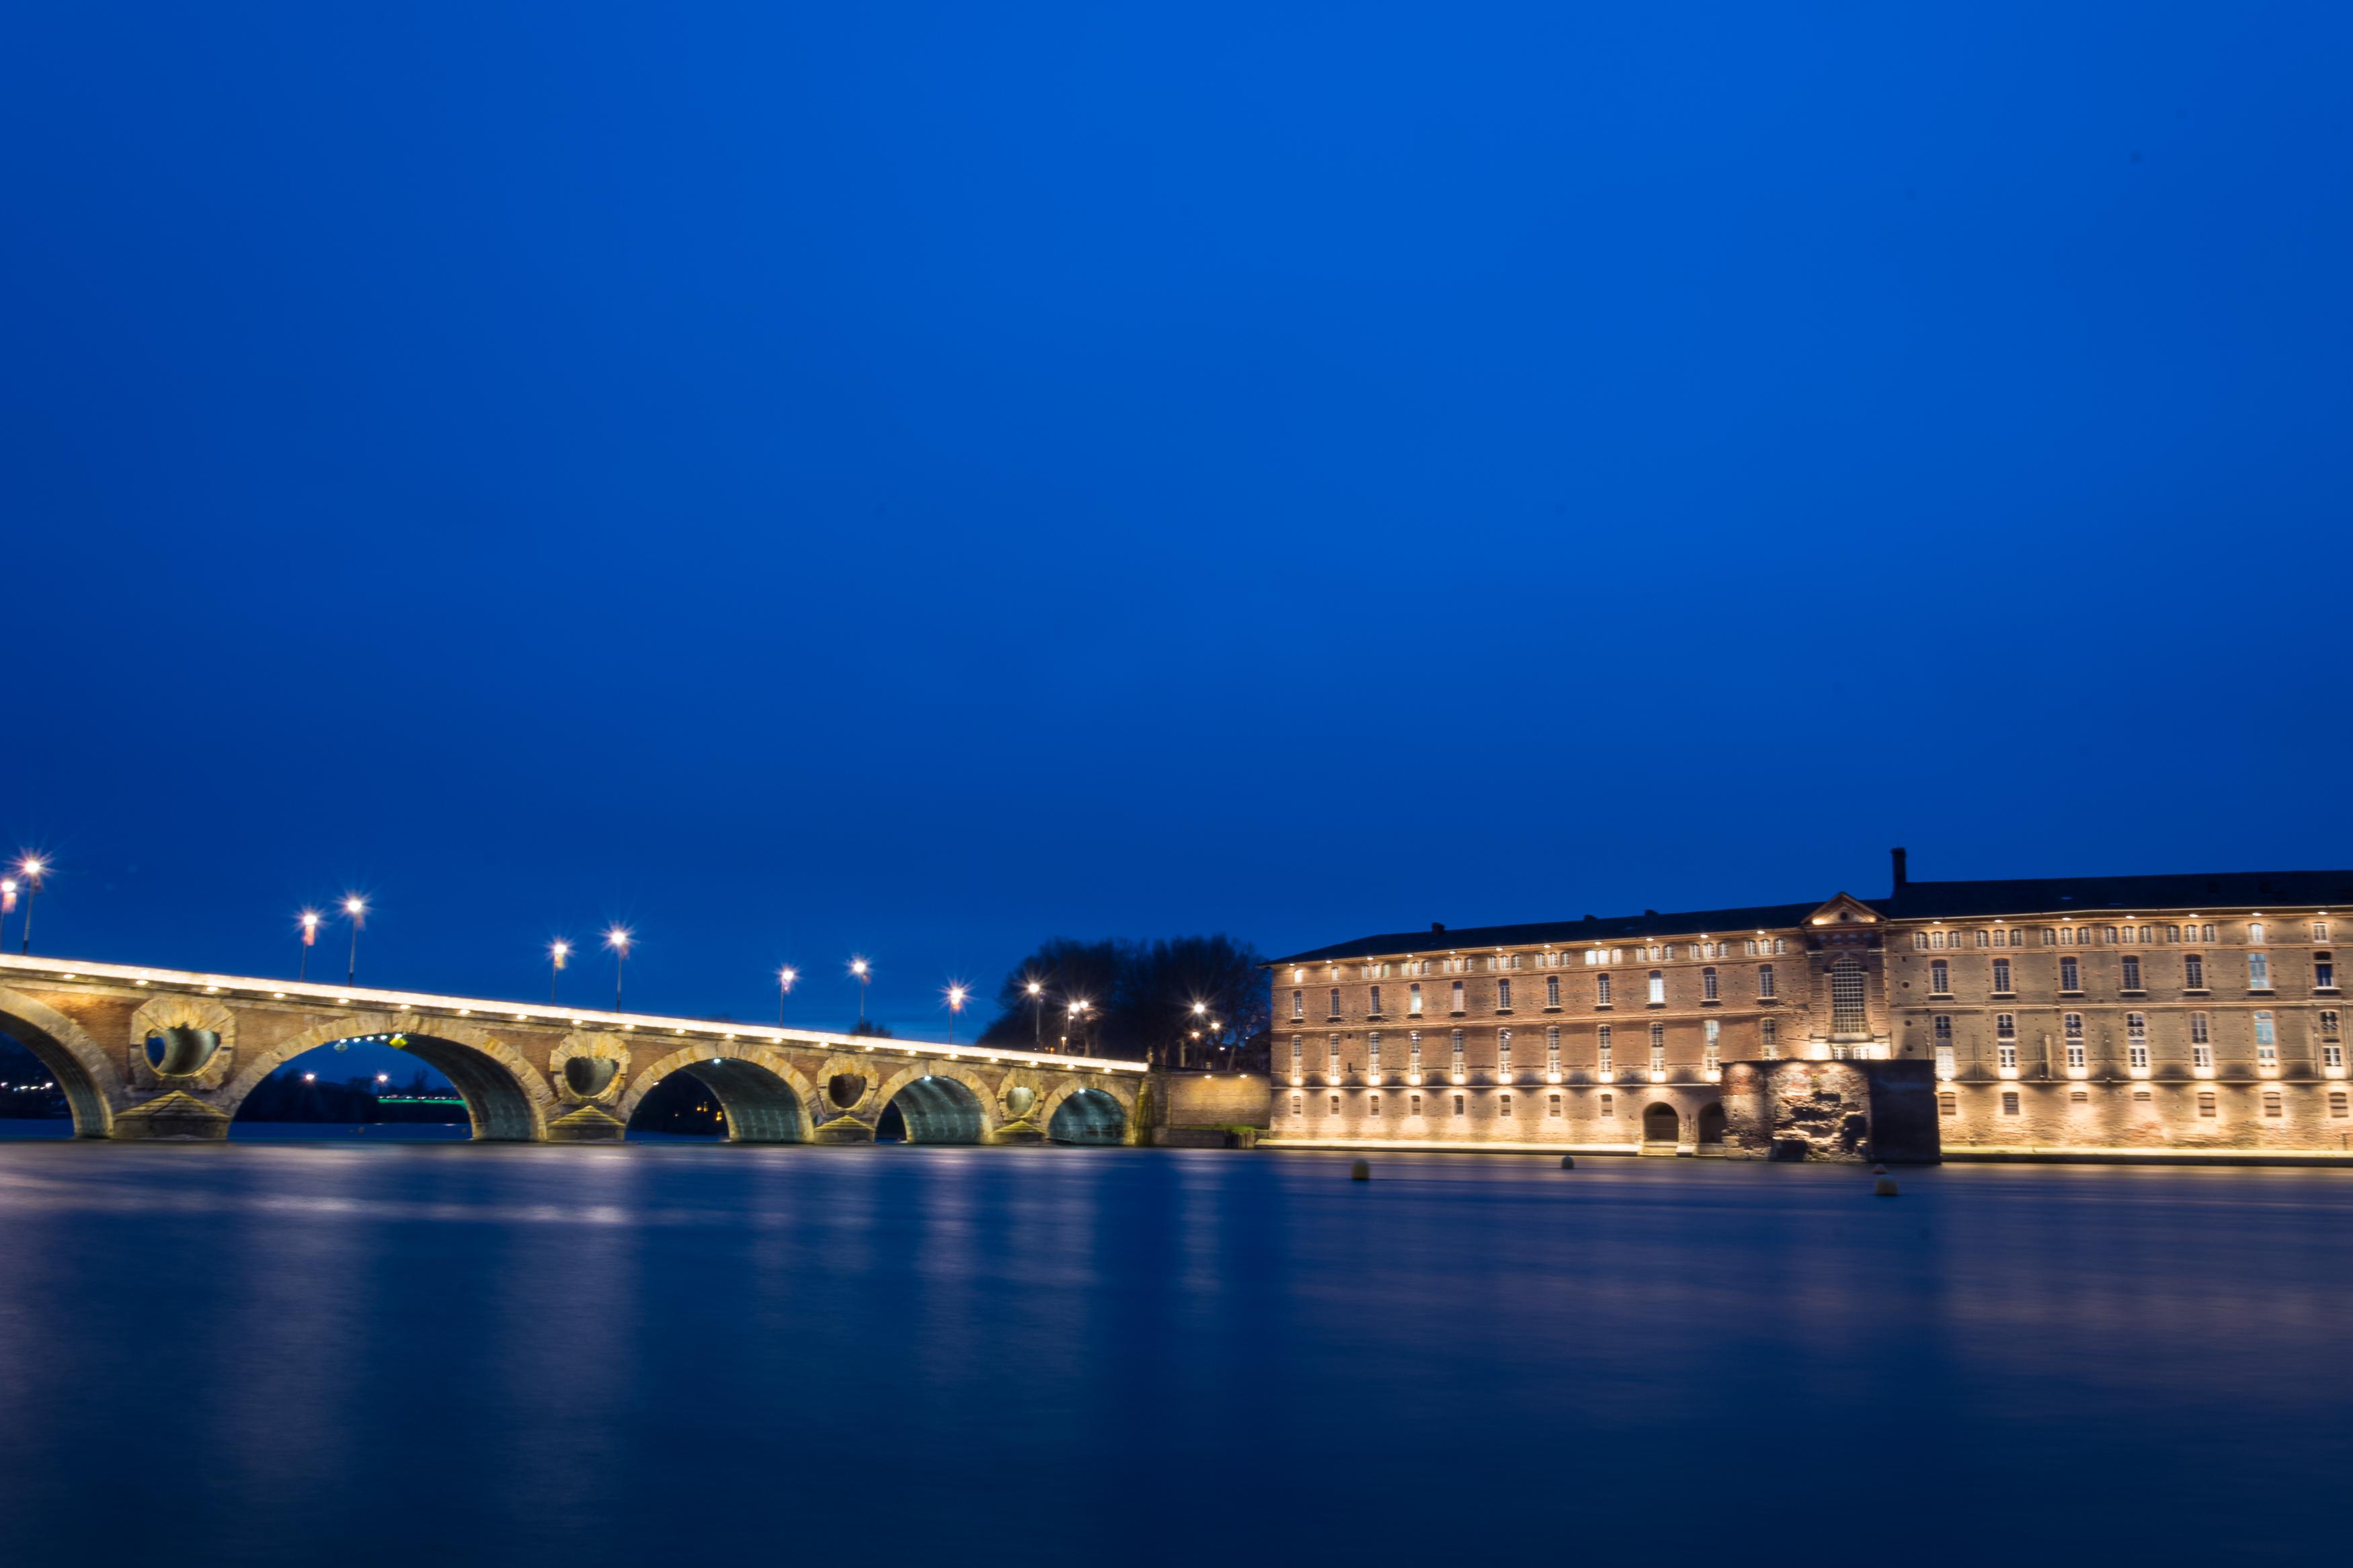 Pont Neuf night